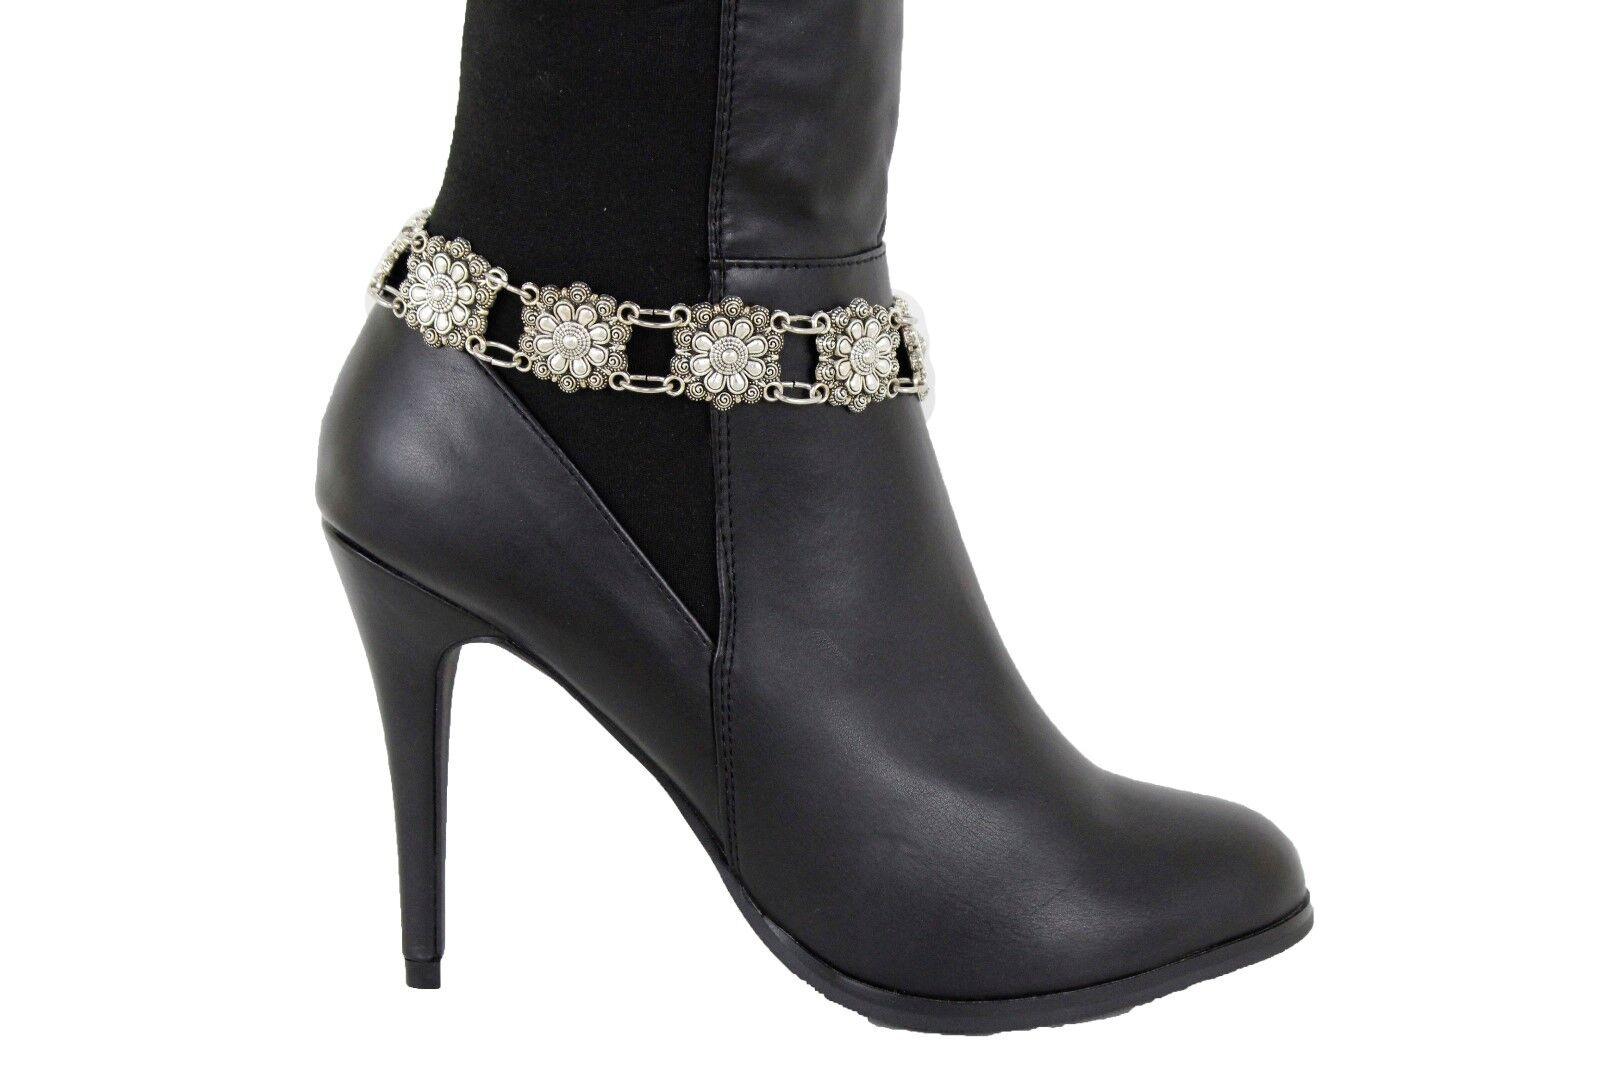 Women Boot Bracelet Silver Metal Chain Anklet Shoe Bling Flower Charm Strap Cute